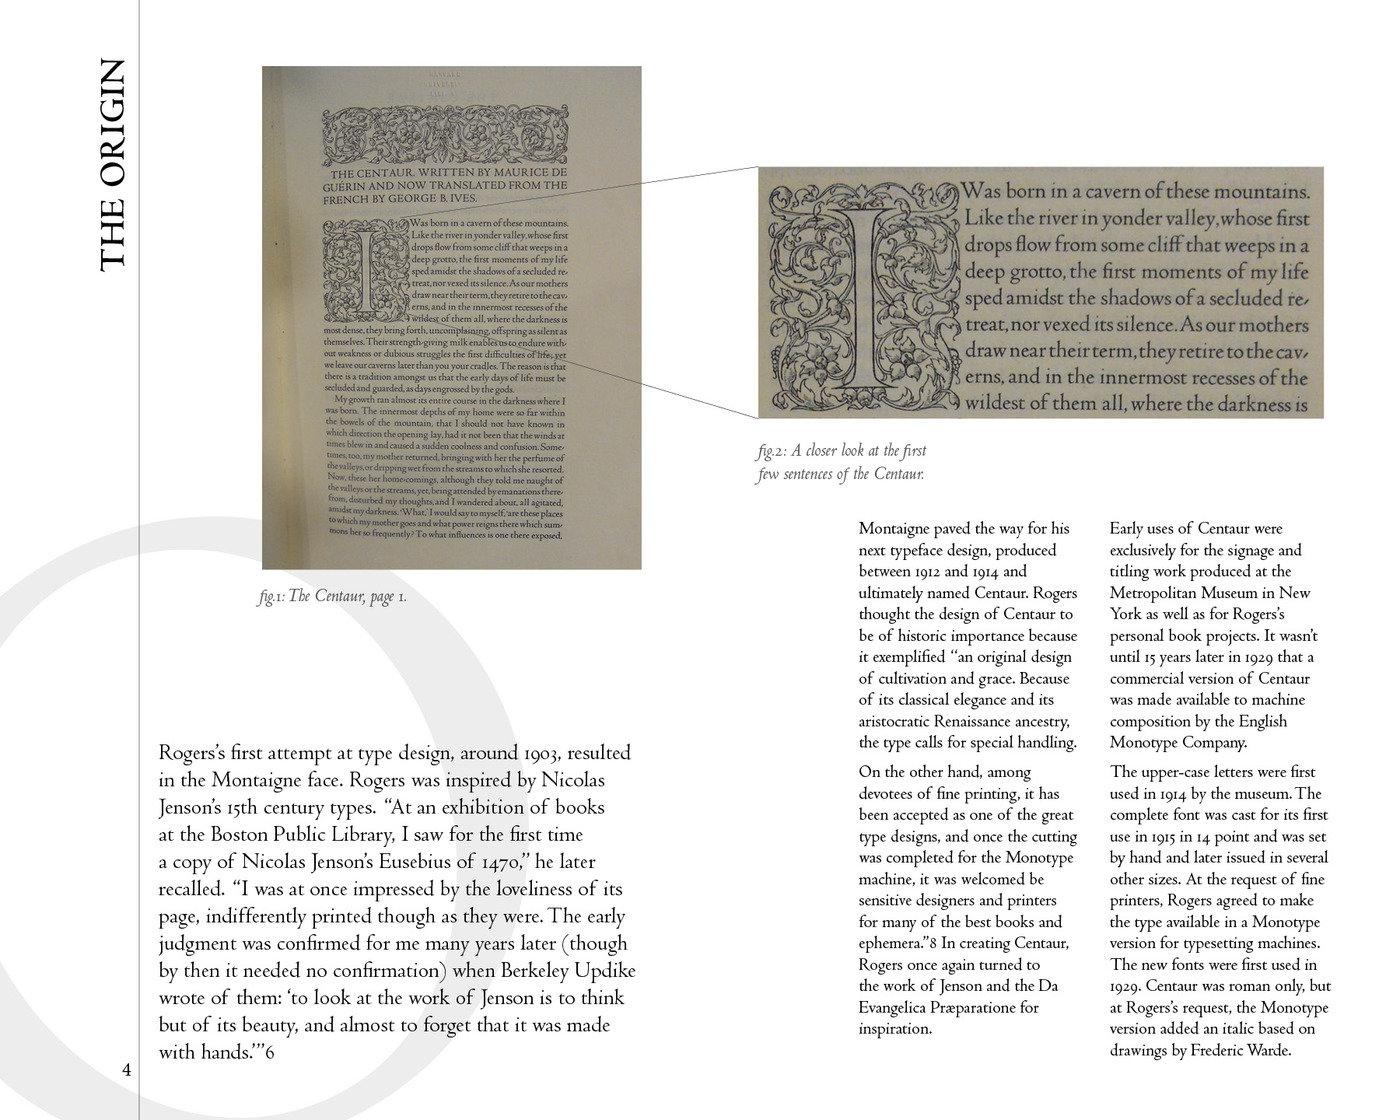 Centaur Typeface Book by David Brennan at Coroflot com